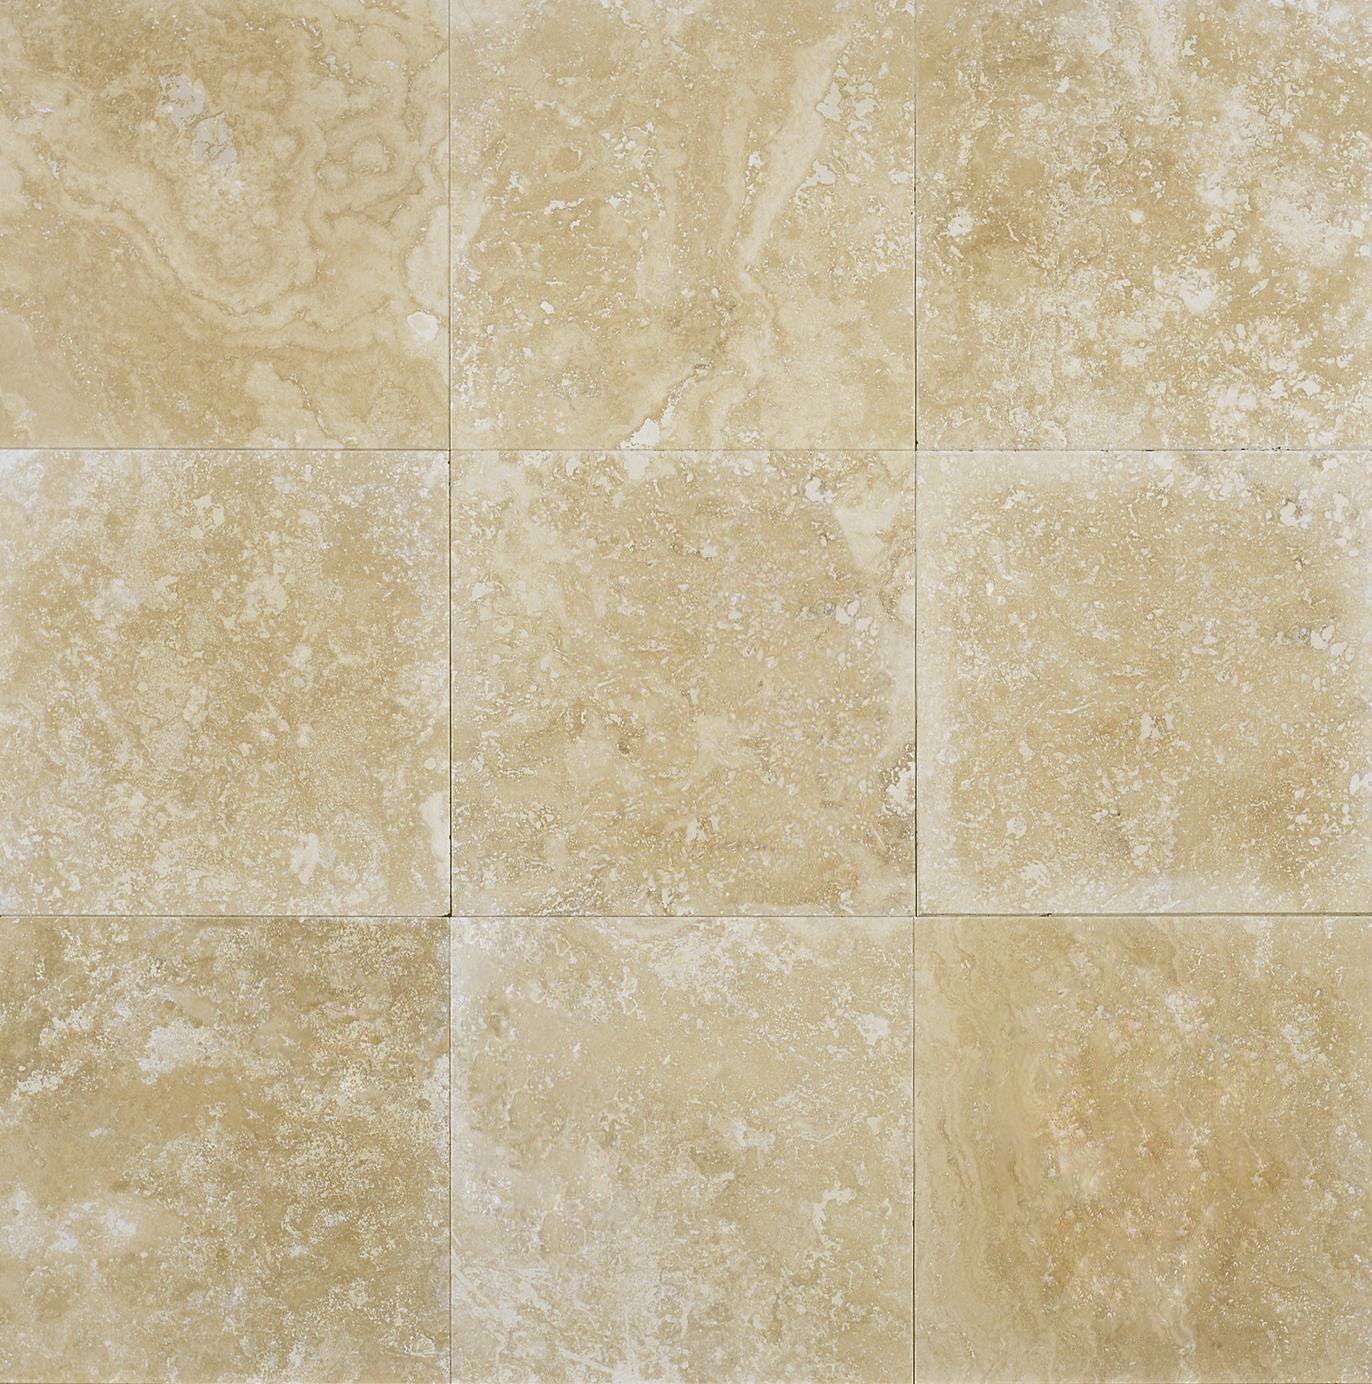 Modern Kitchen Floor Tiles Texture: Ceramic Or Porcelain Tile For Kitchen Floor